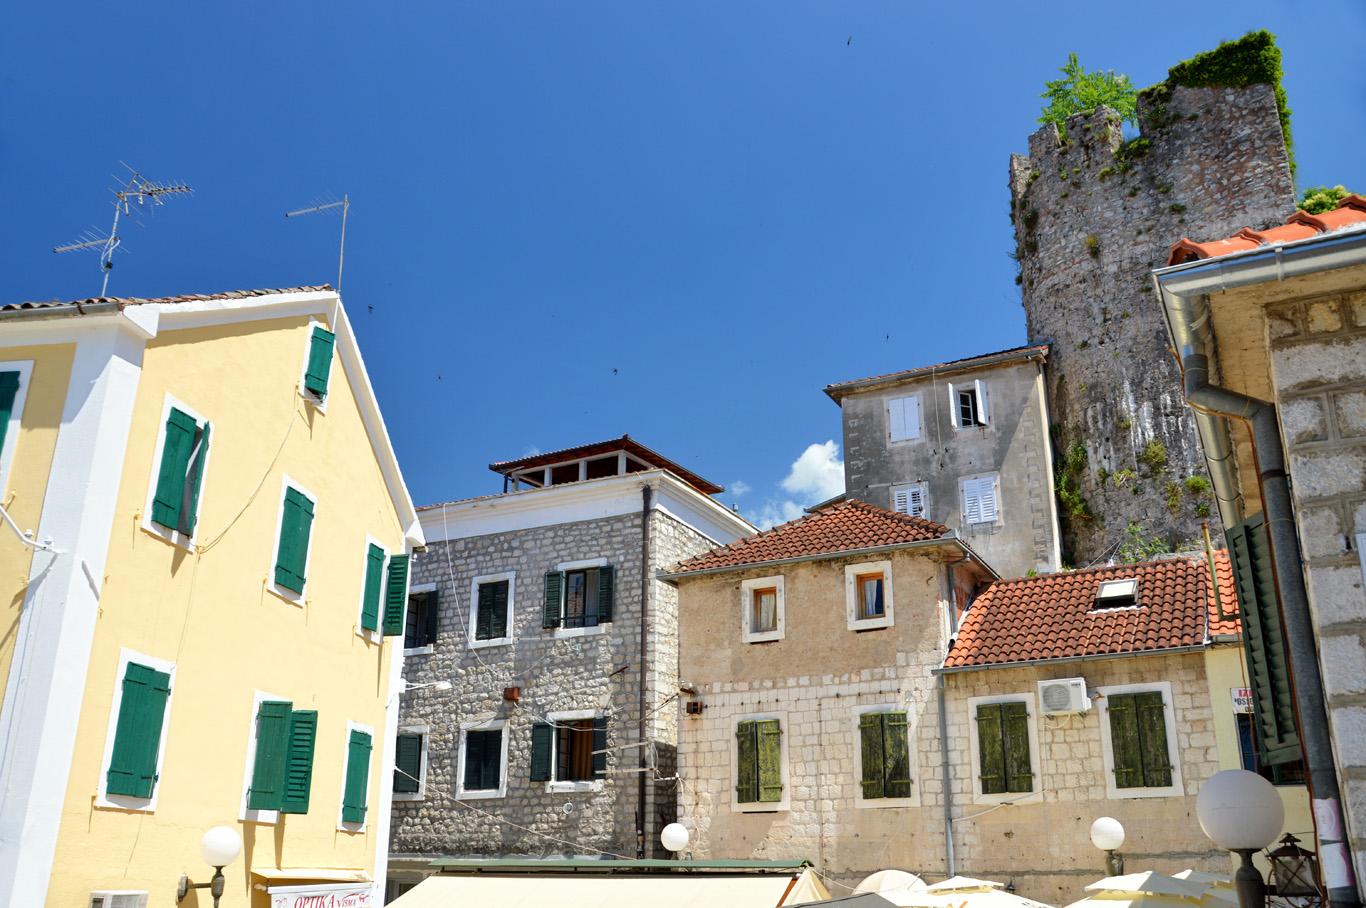 Old Town buildings